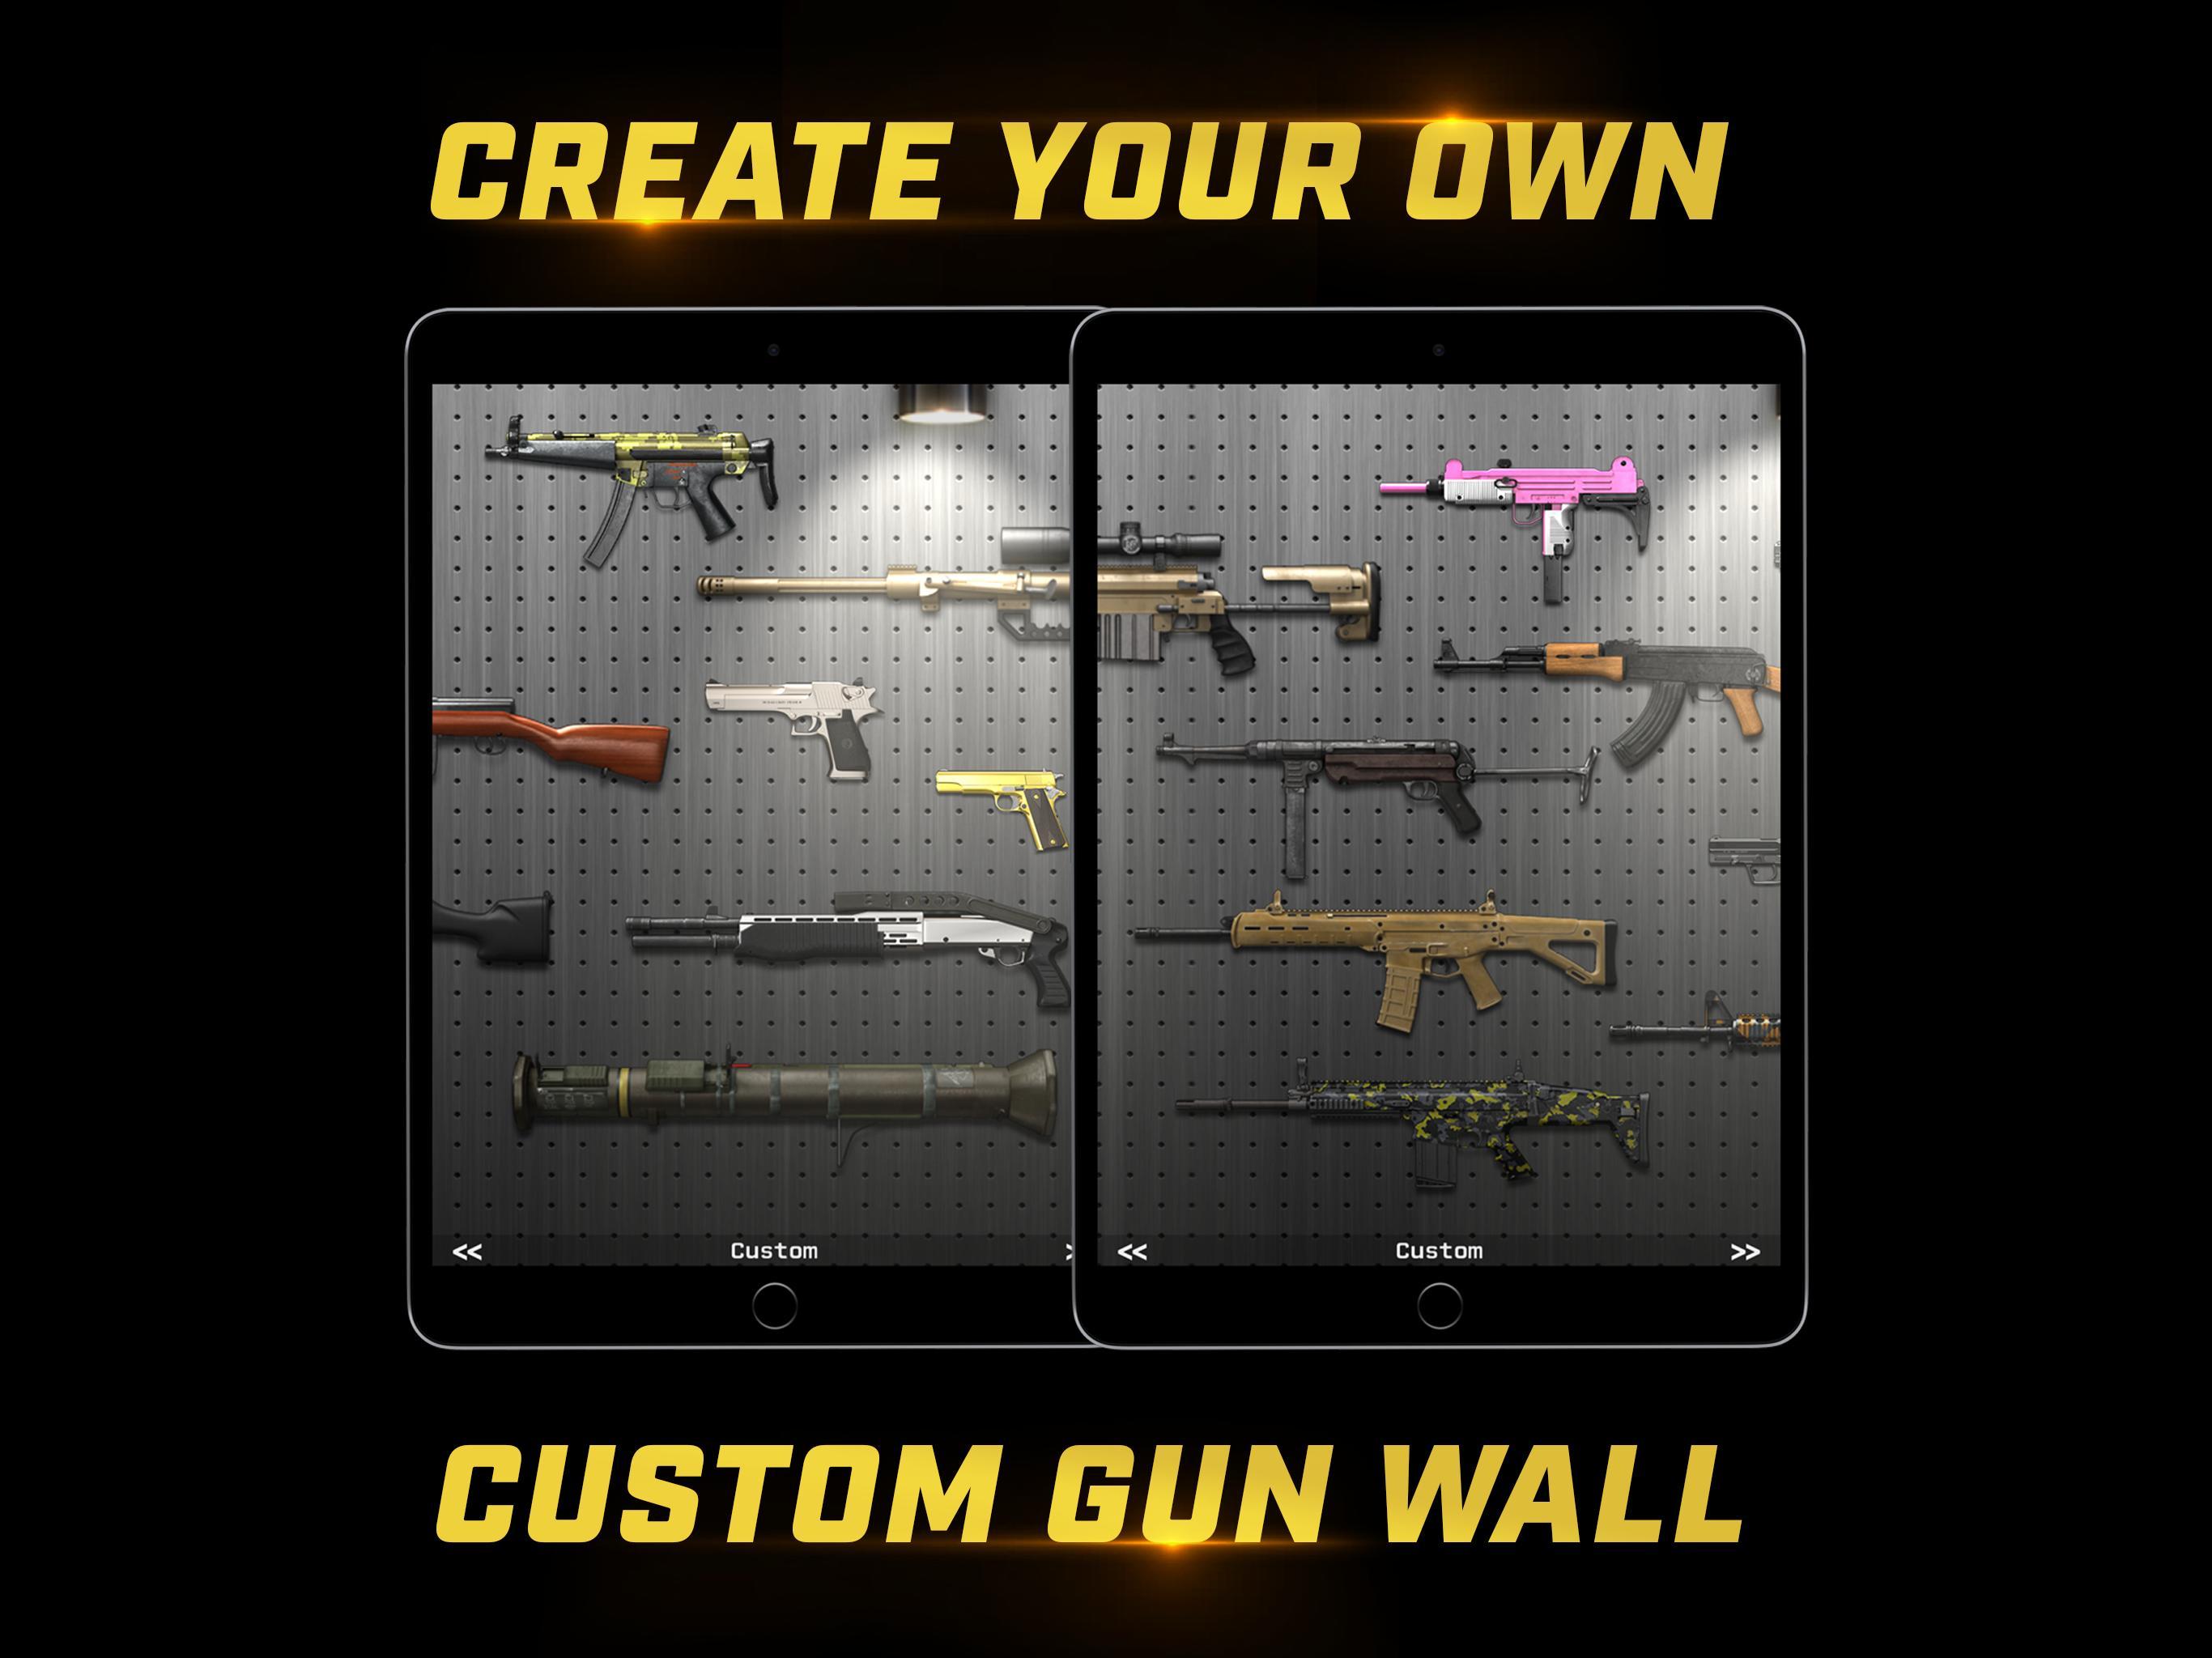 iGun Pro The Original Gun App 5.26 Screenshot 10